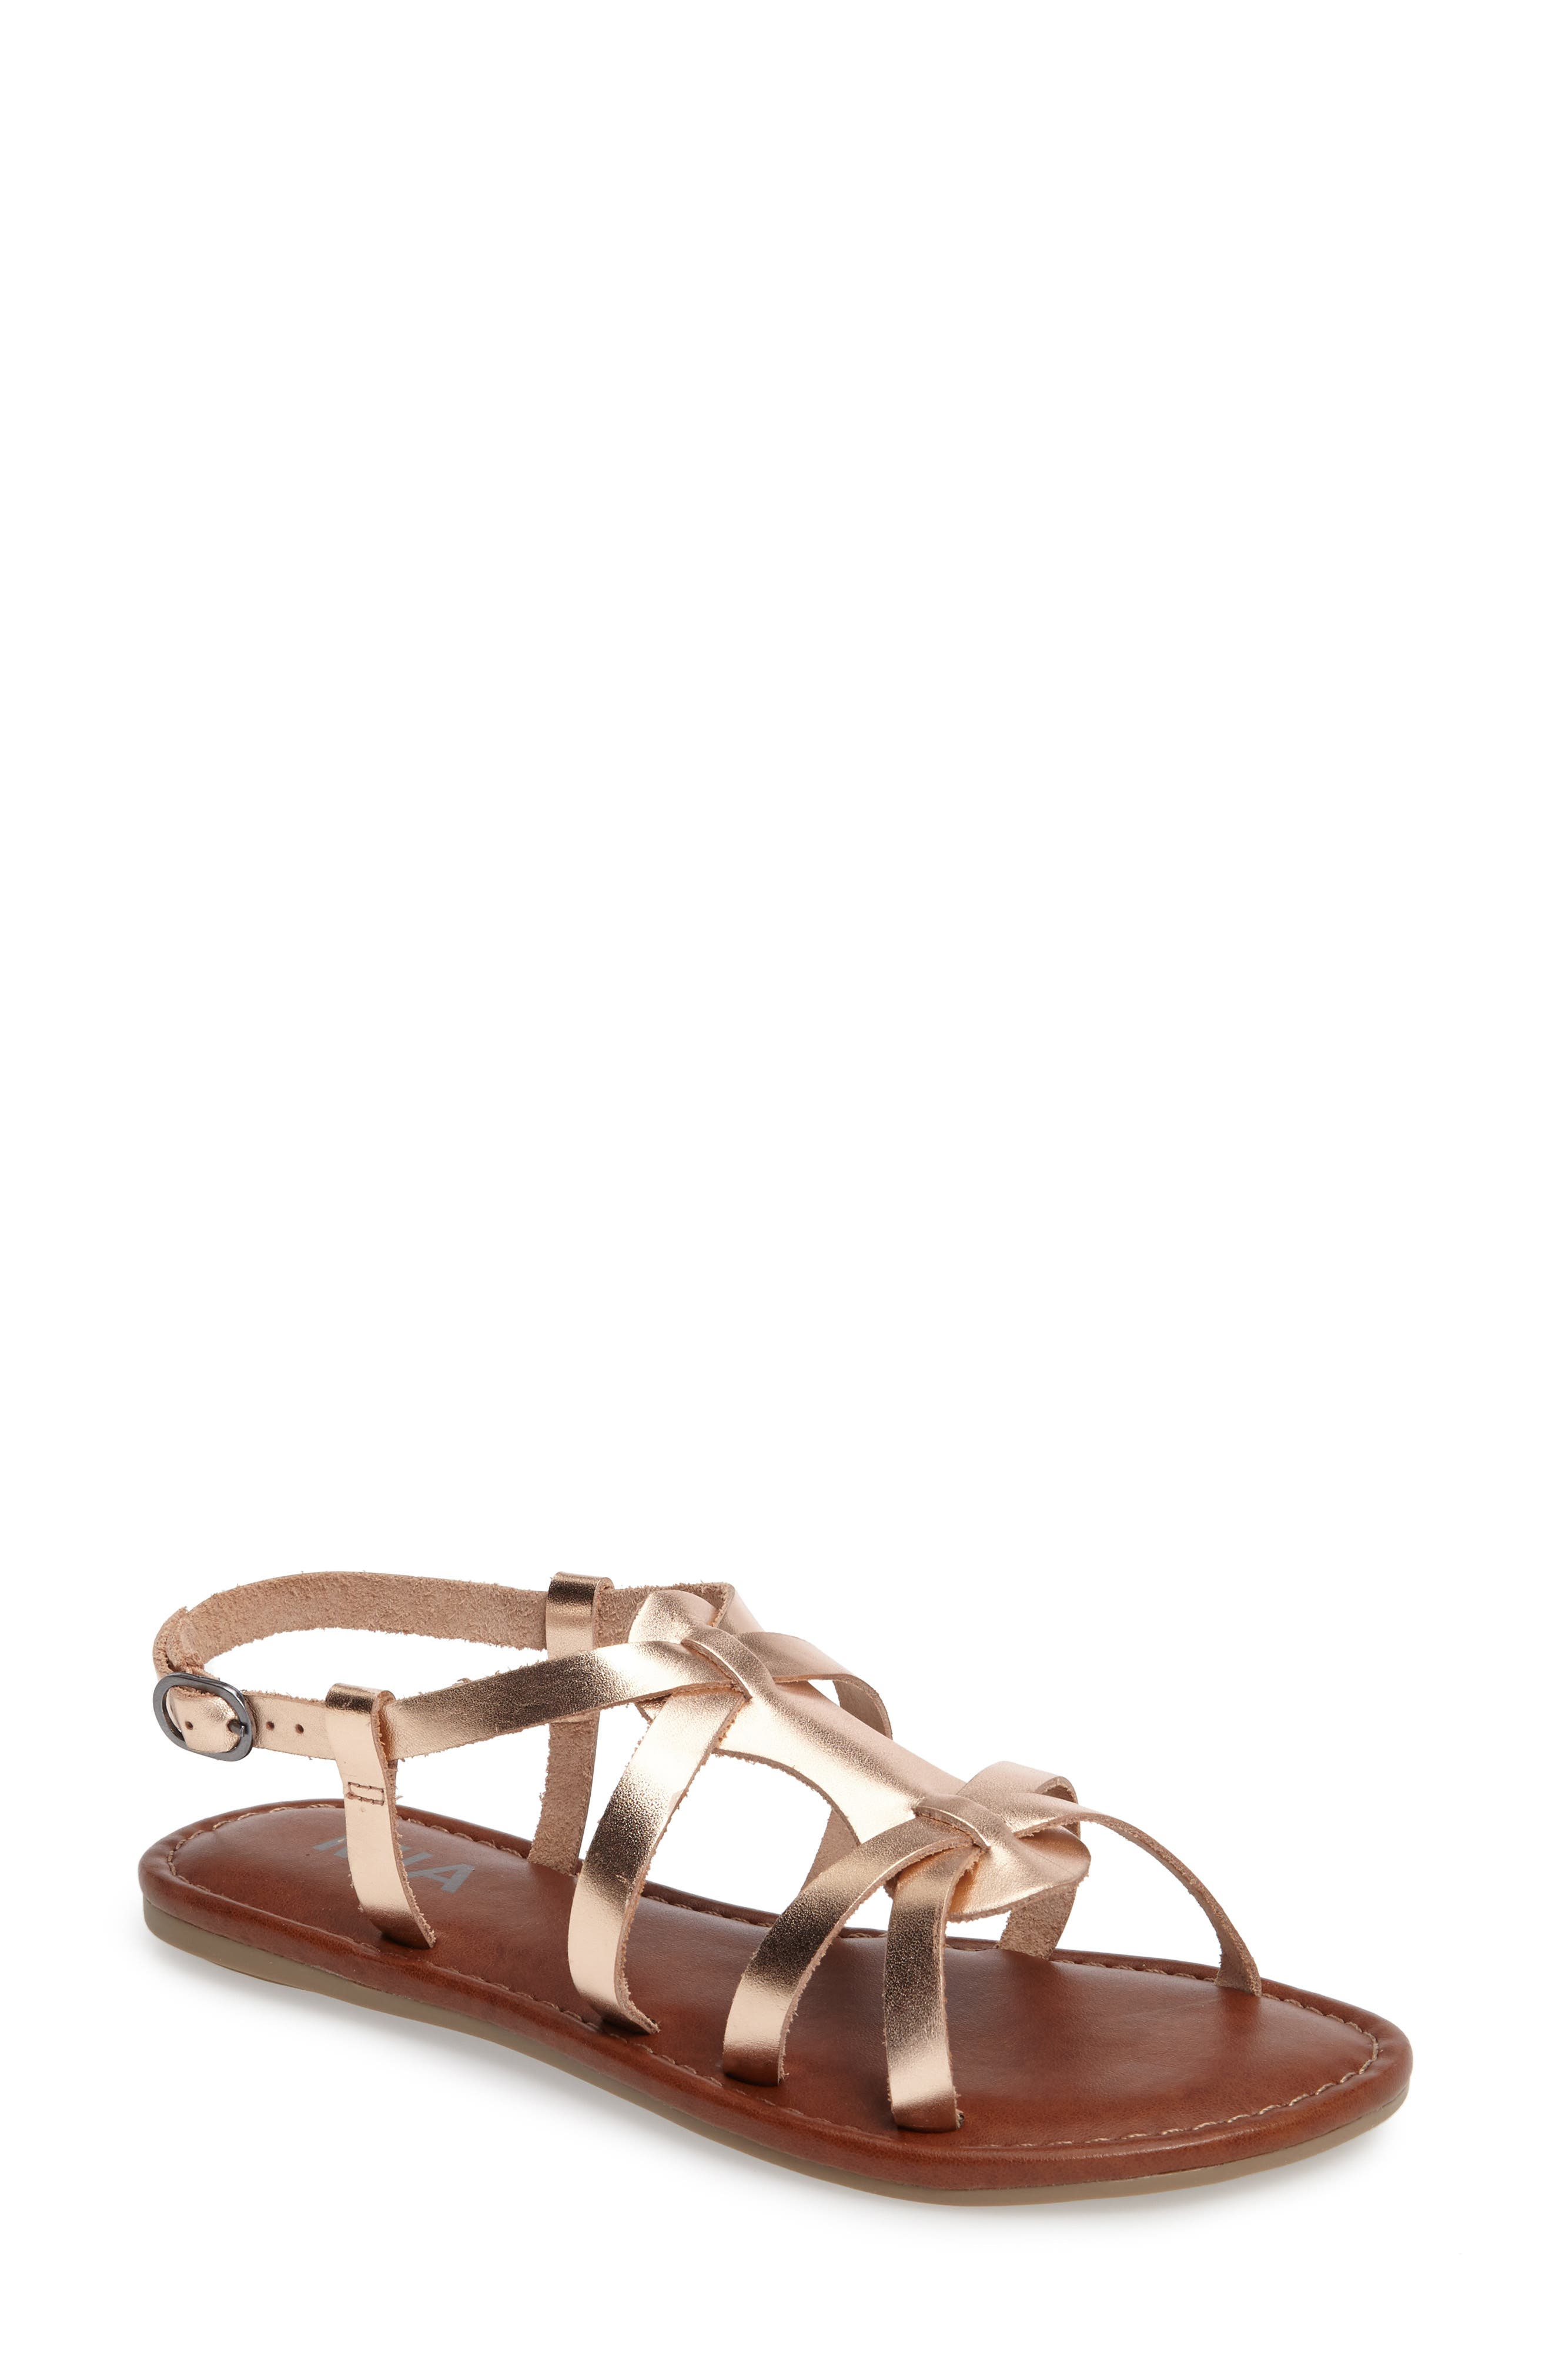 MIA Buttercup Sandal